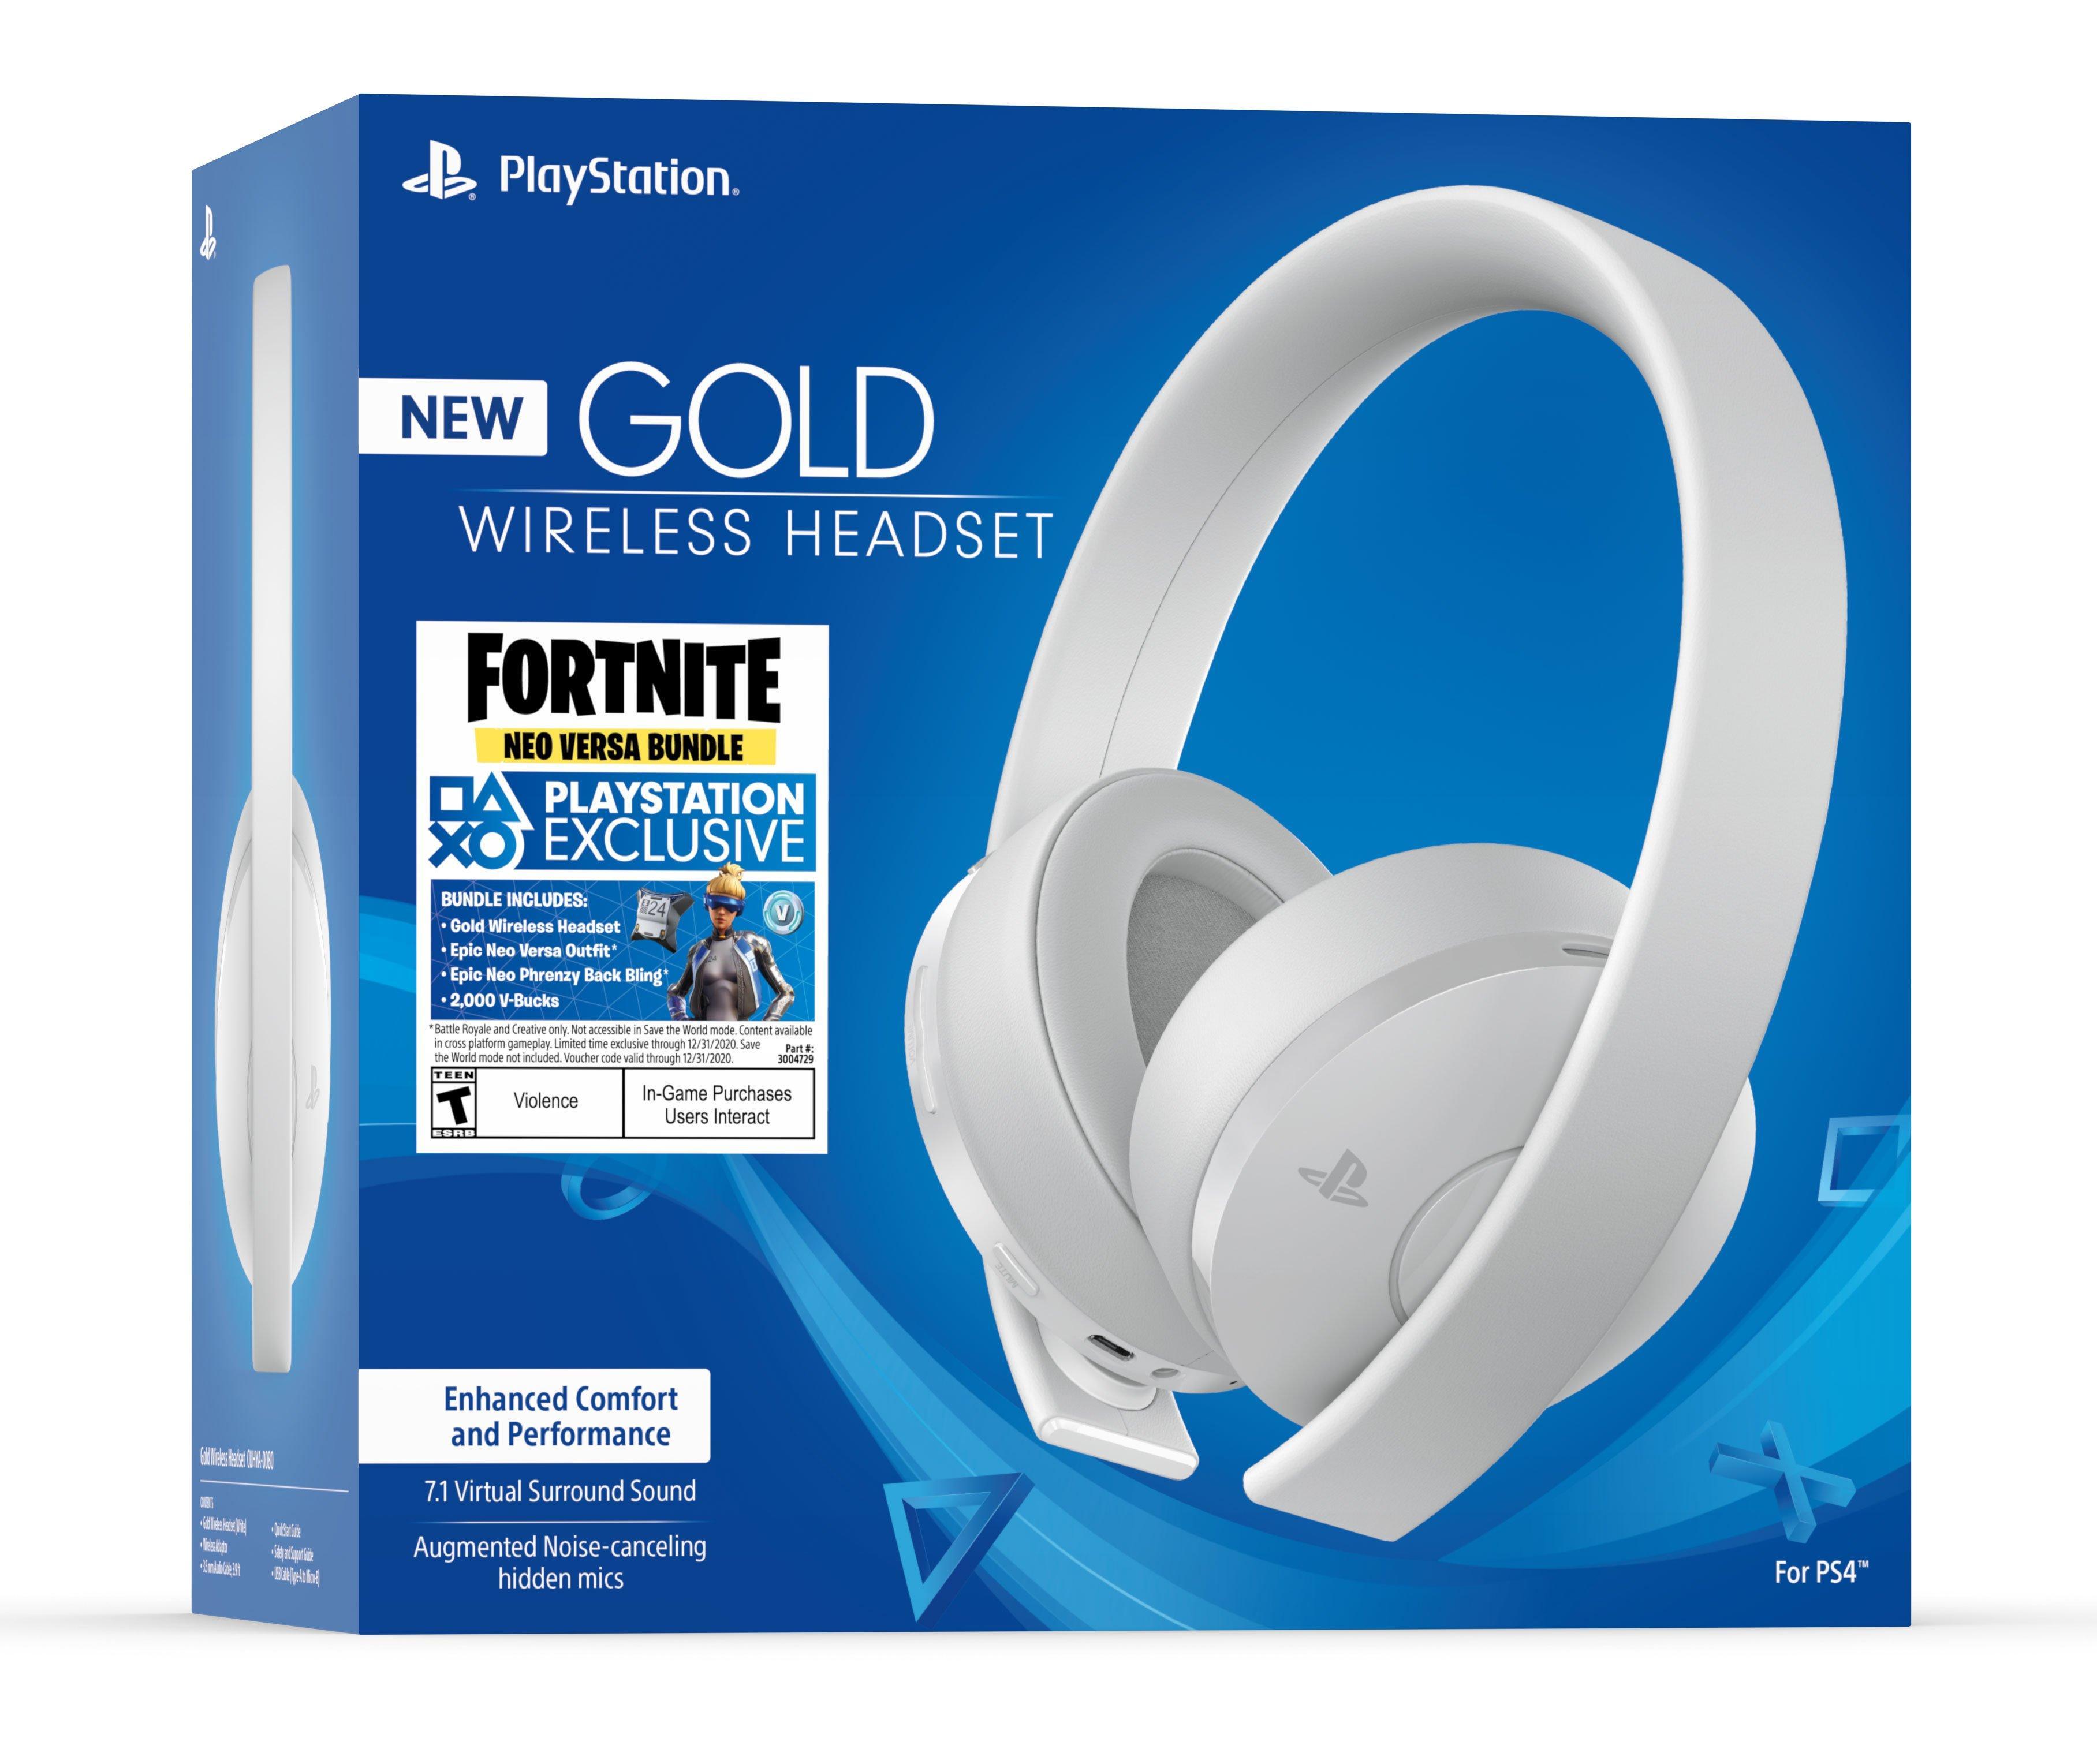 Playstation 4 Fortnite Neo Versa Bundle Gold Wireless Gaming Headset White Playstation 4 Gamestop